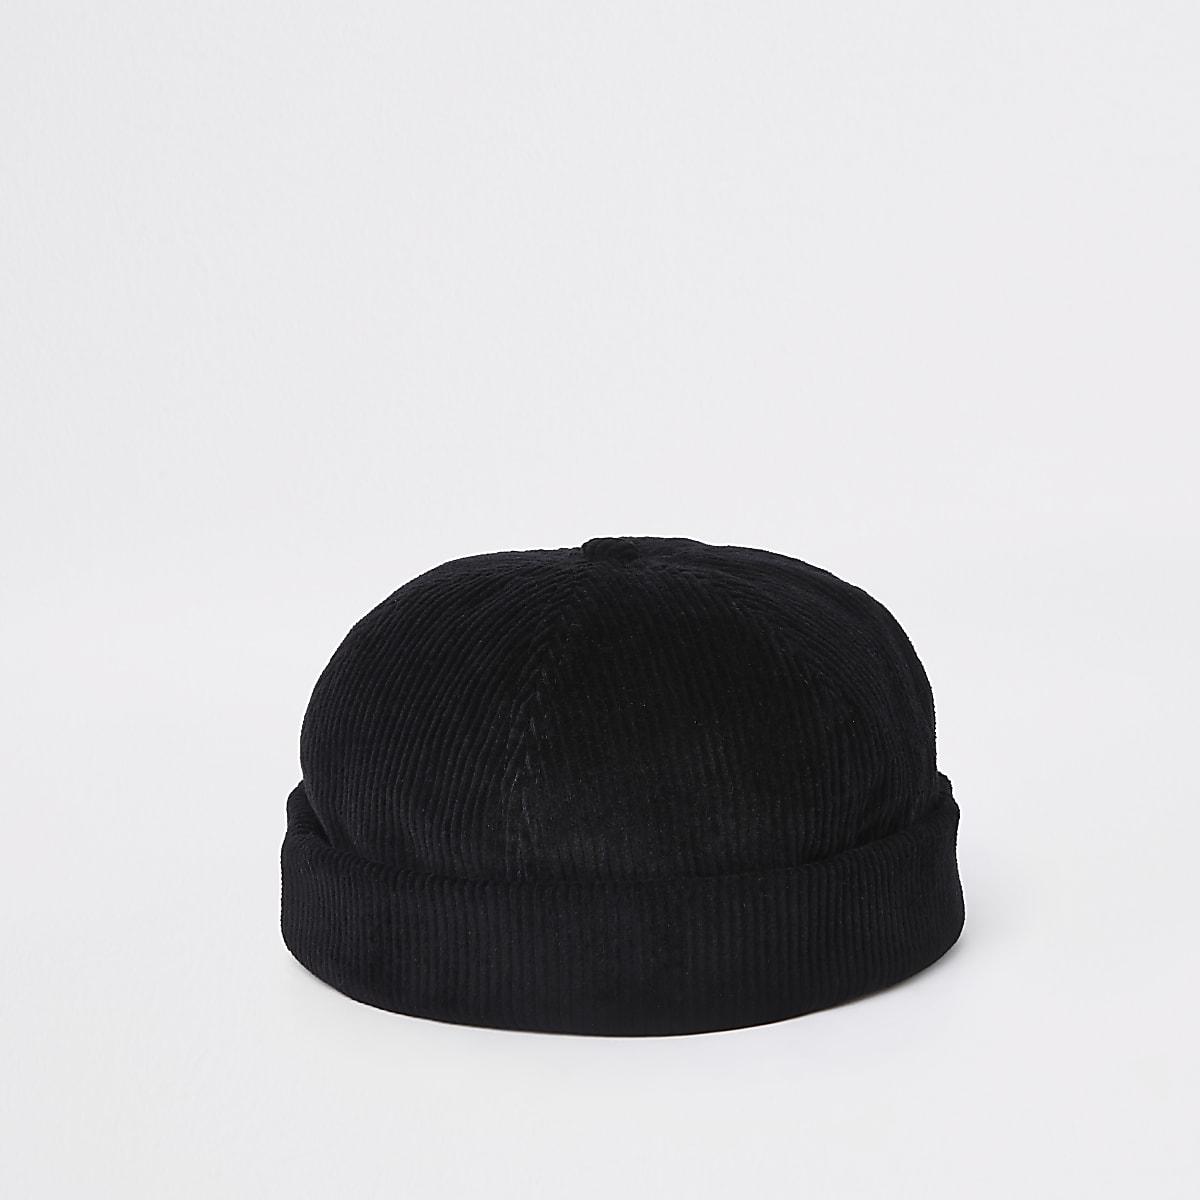 Black cord docker beanie hat